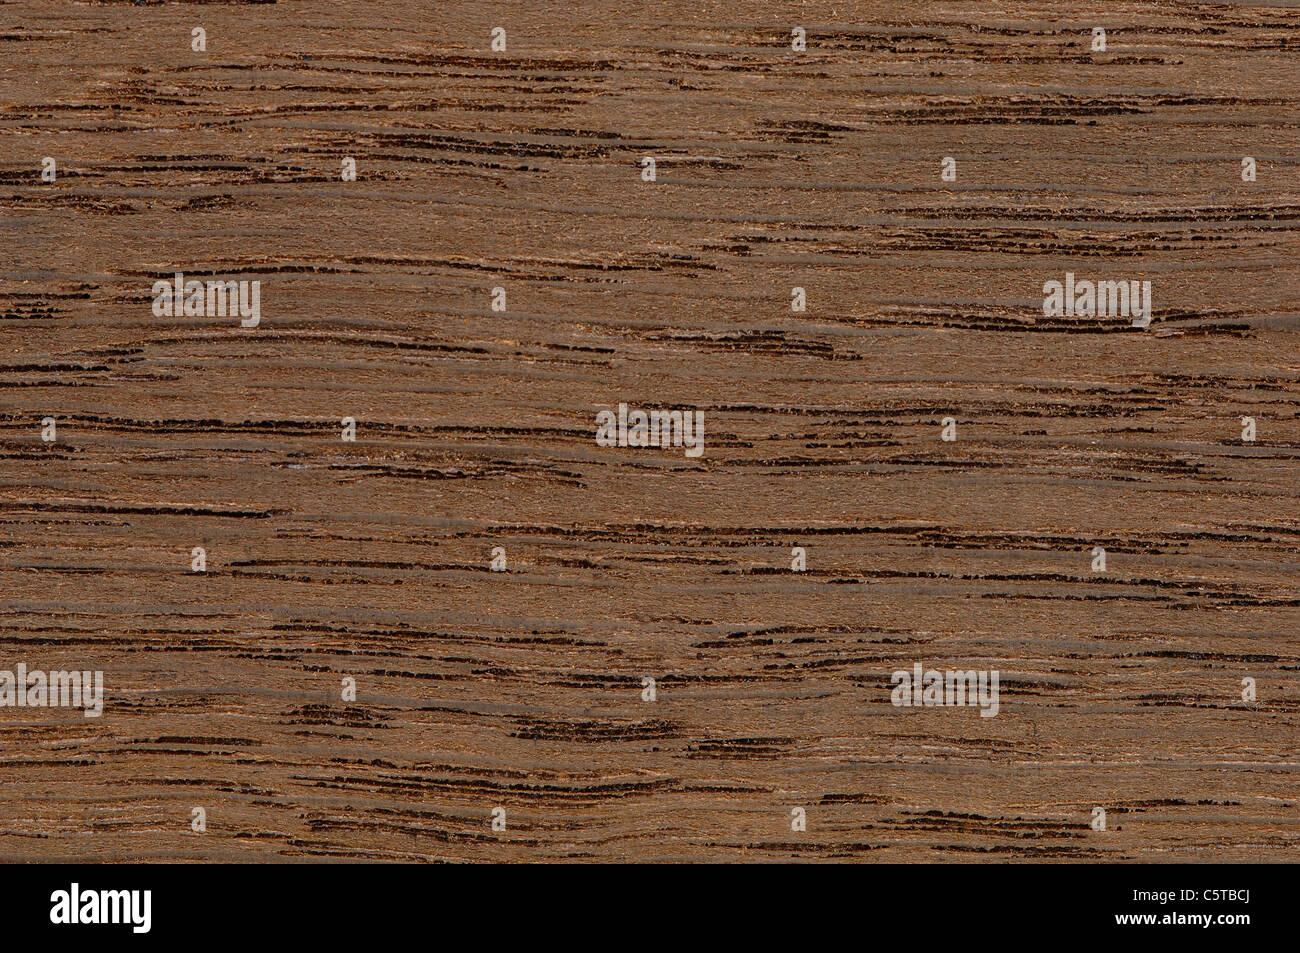 Wood surface, Moor Oak wood (Quercus robur) full frame - Stock Image